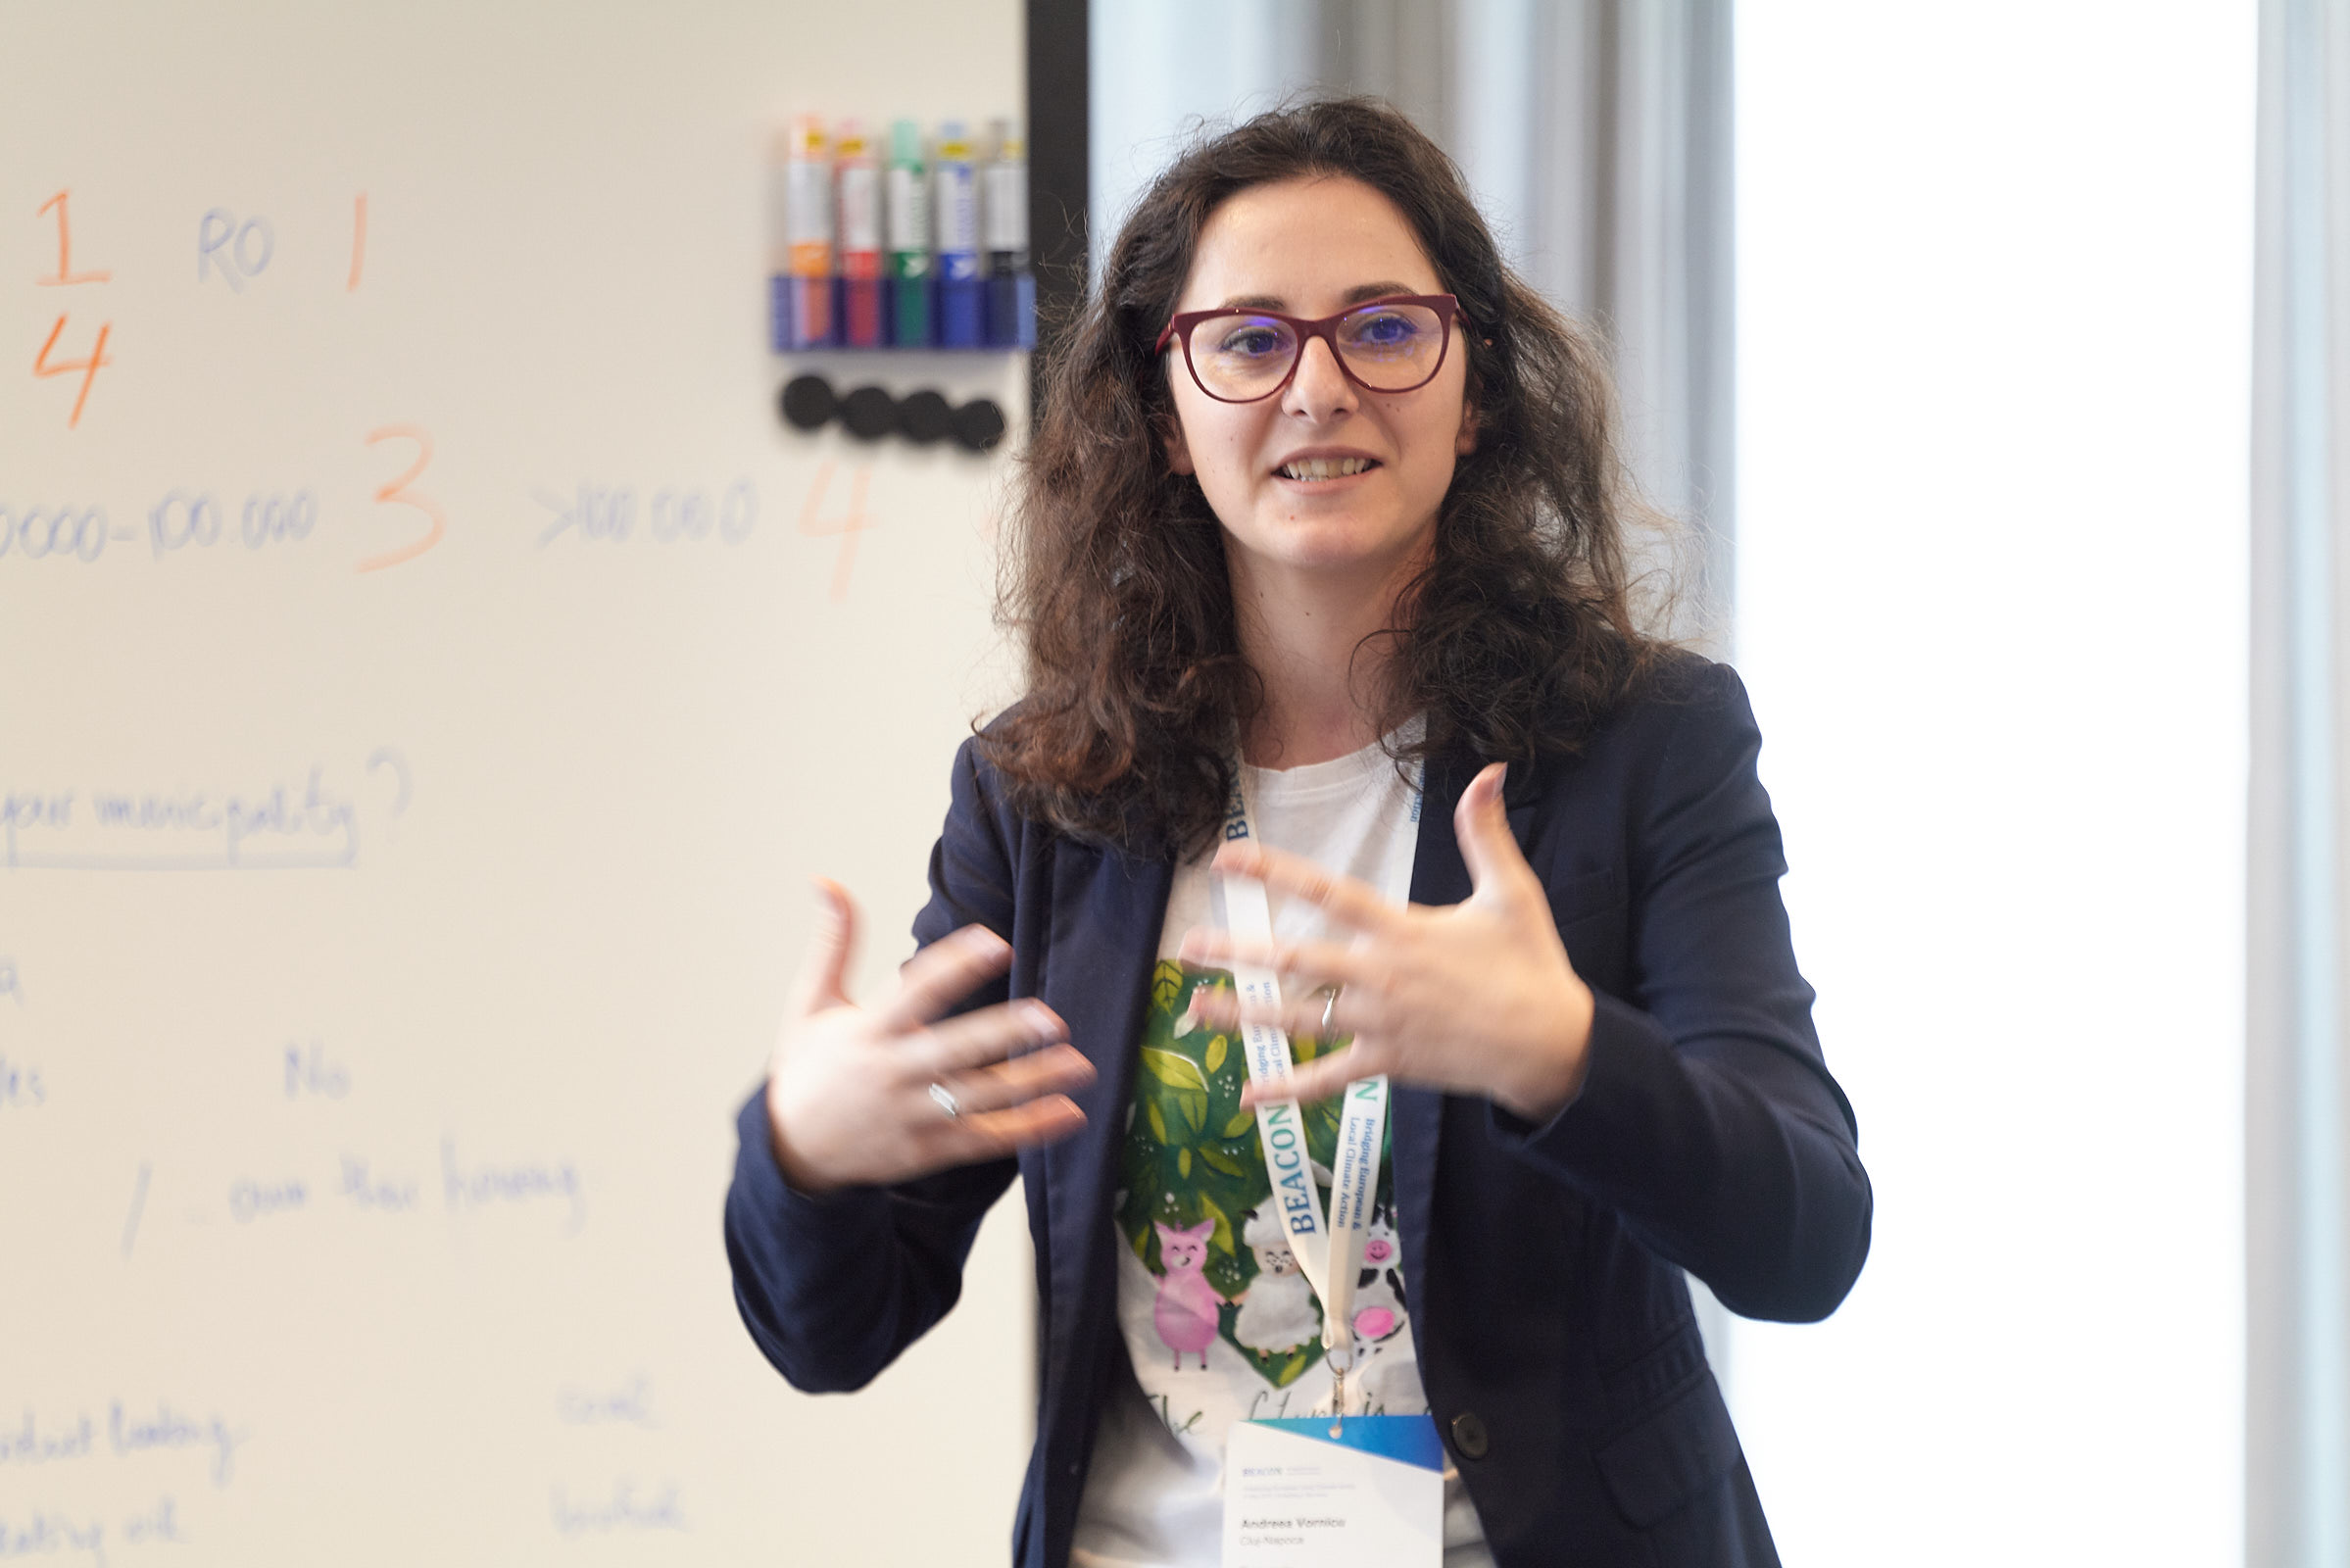 Andreea Vornicu speaking